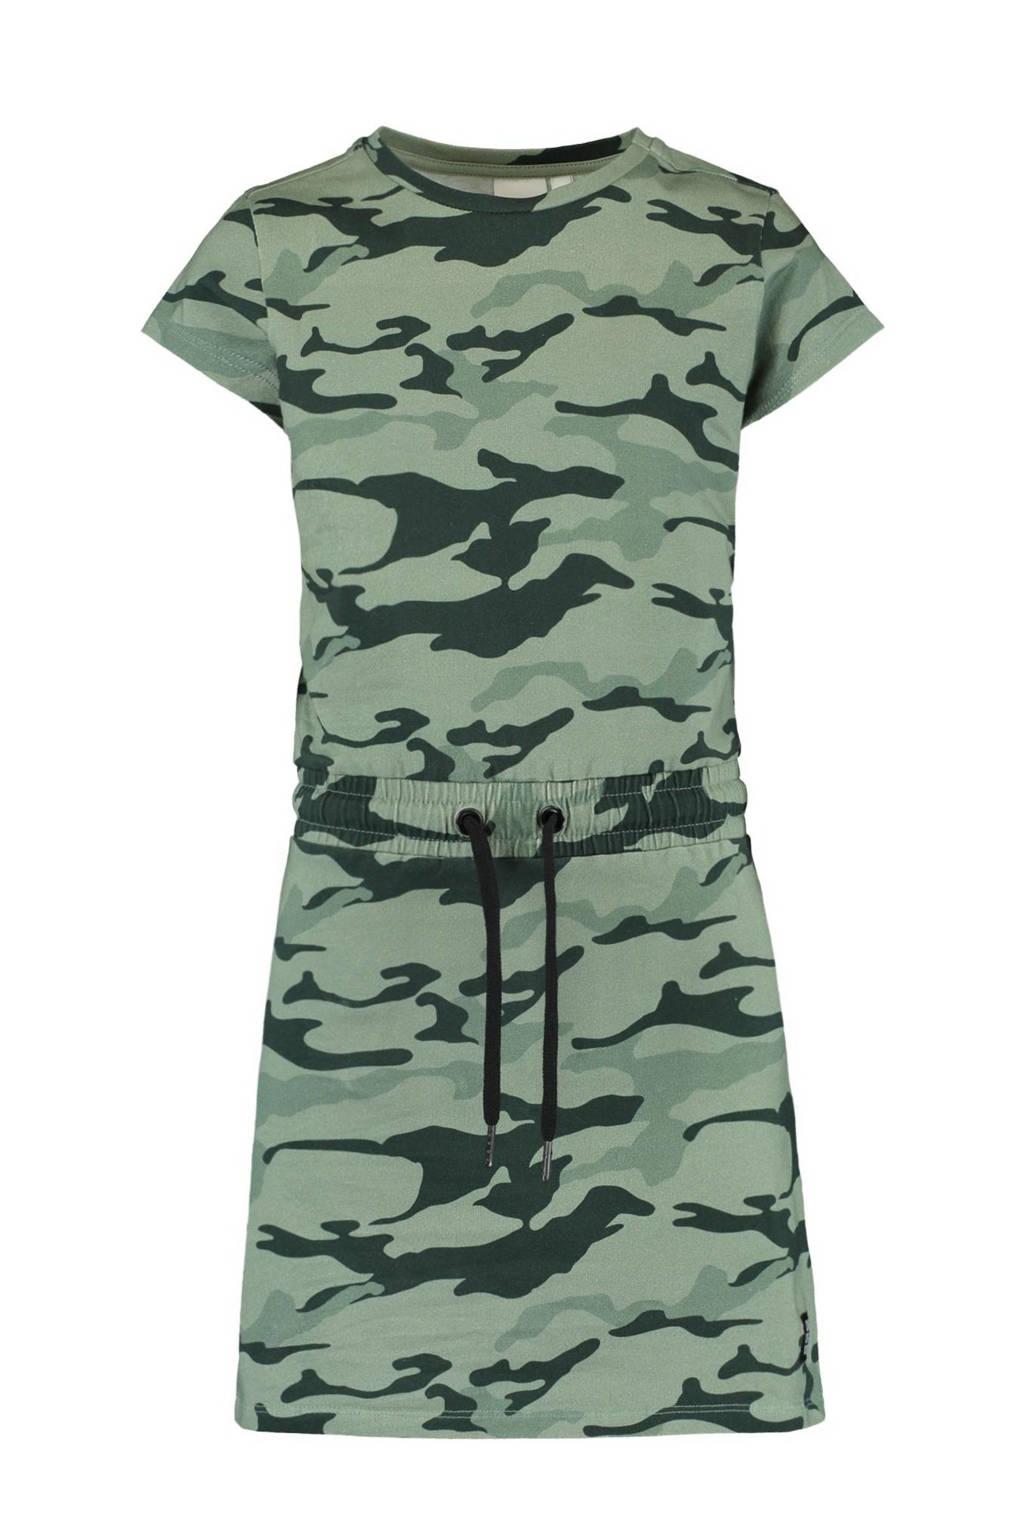 CoolCat Junior jersey jurk Dana met camouflageprint mintgroen/army groen